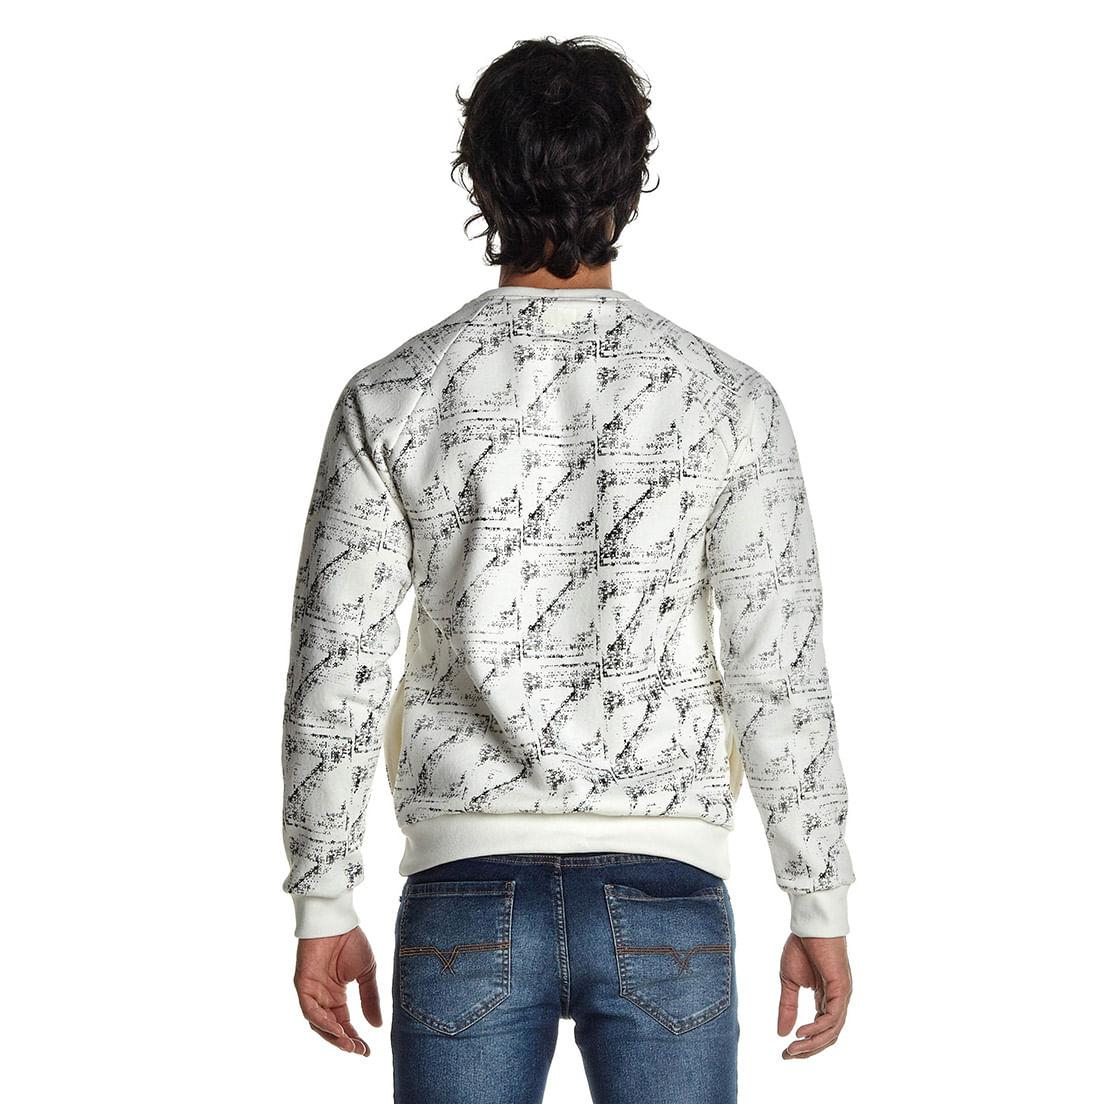 Blusa Osmoze Moletom 02 Estampa Total 108120015 Branco